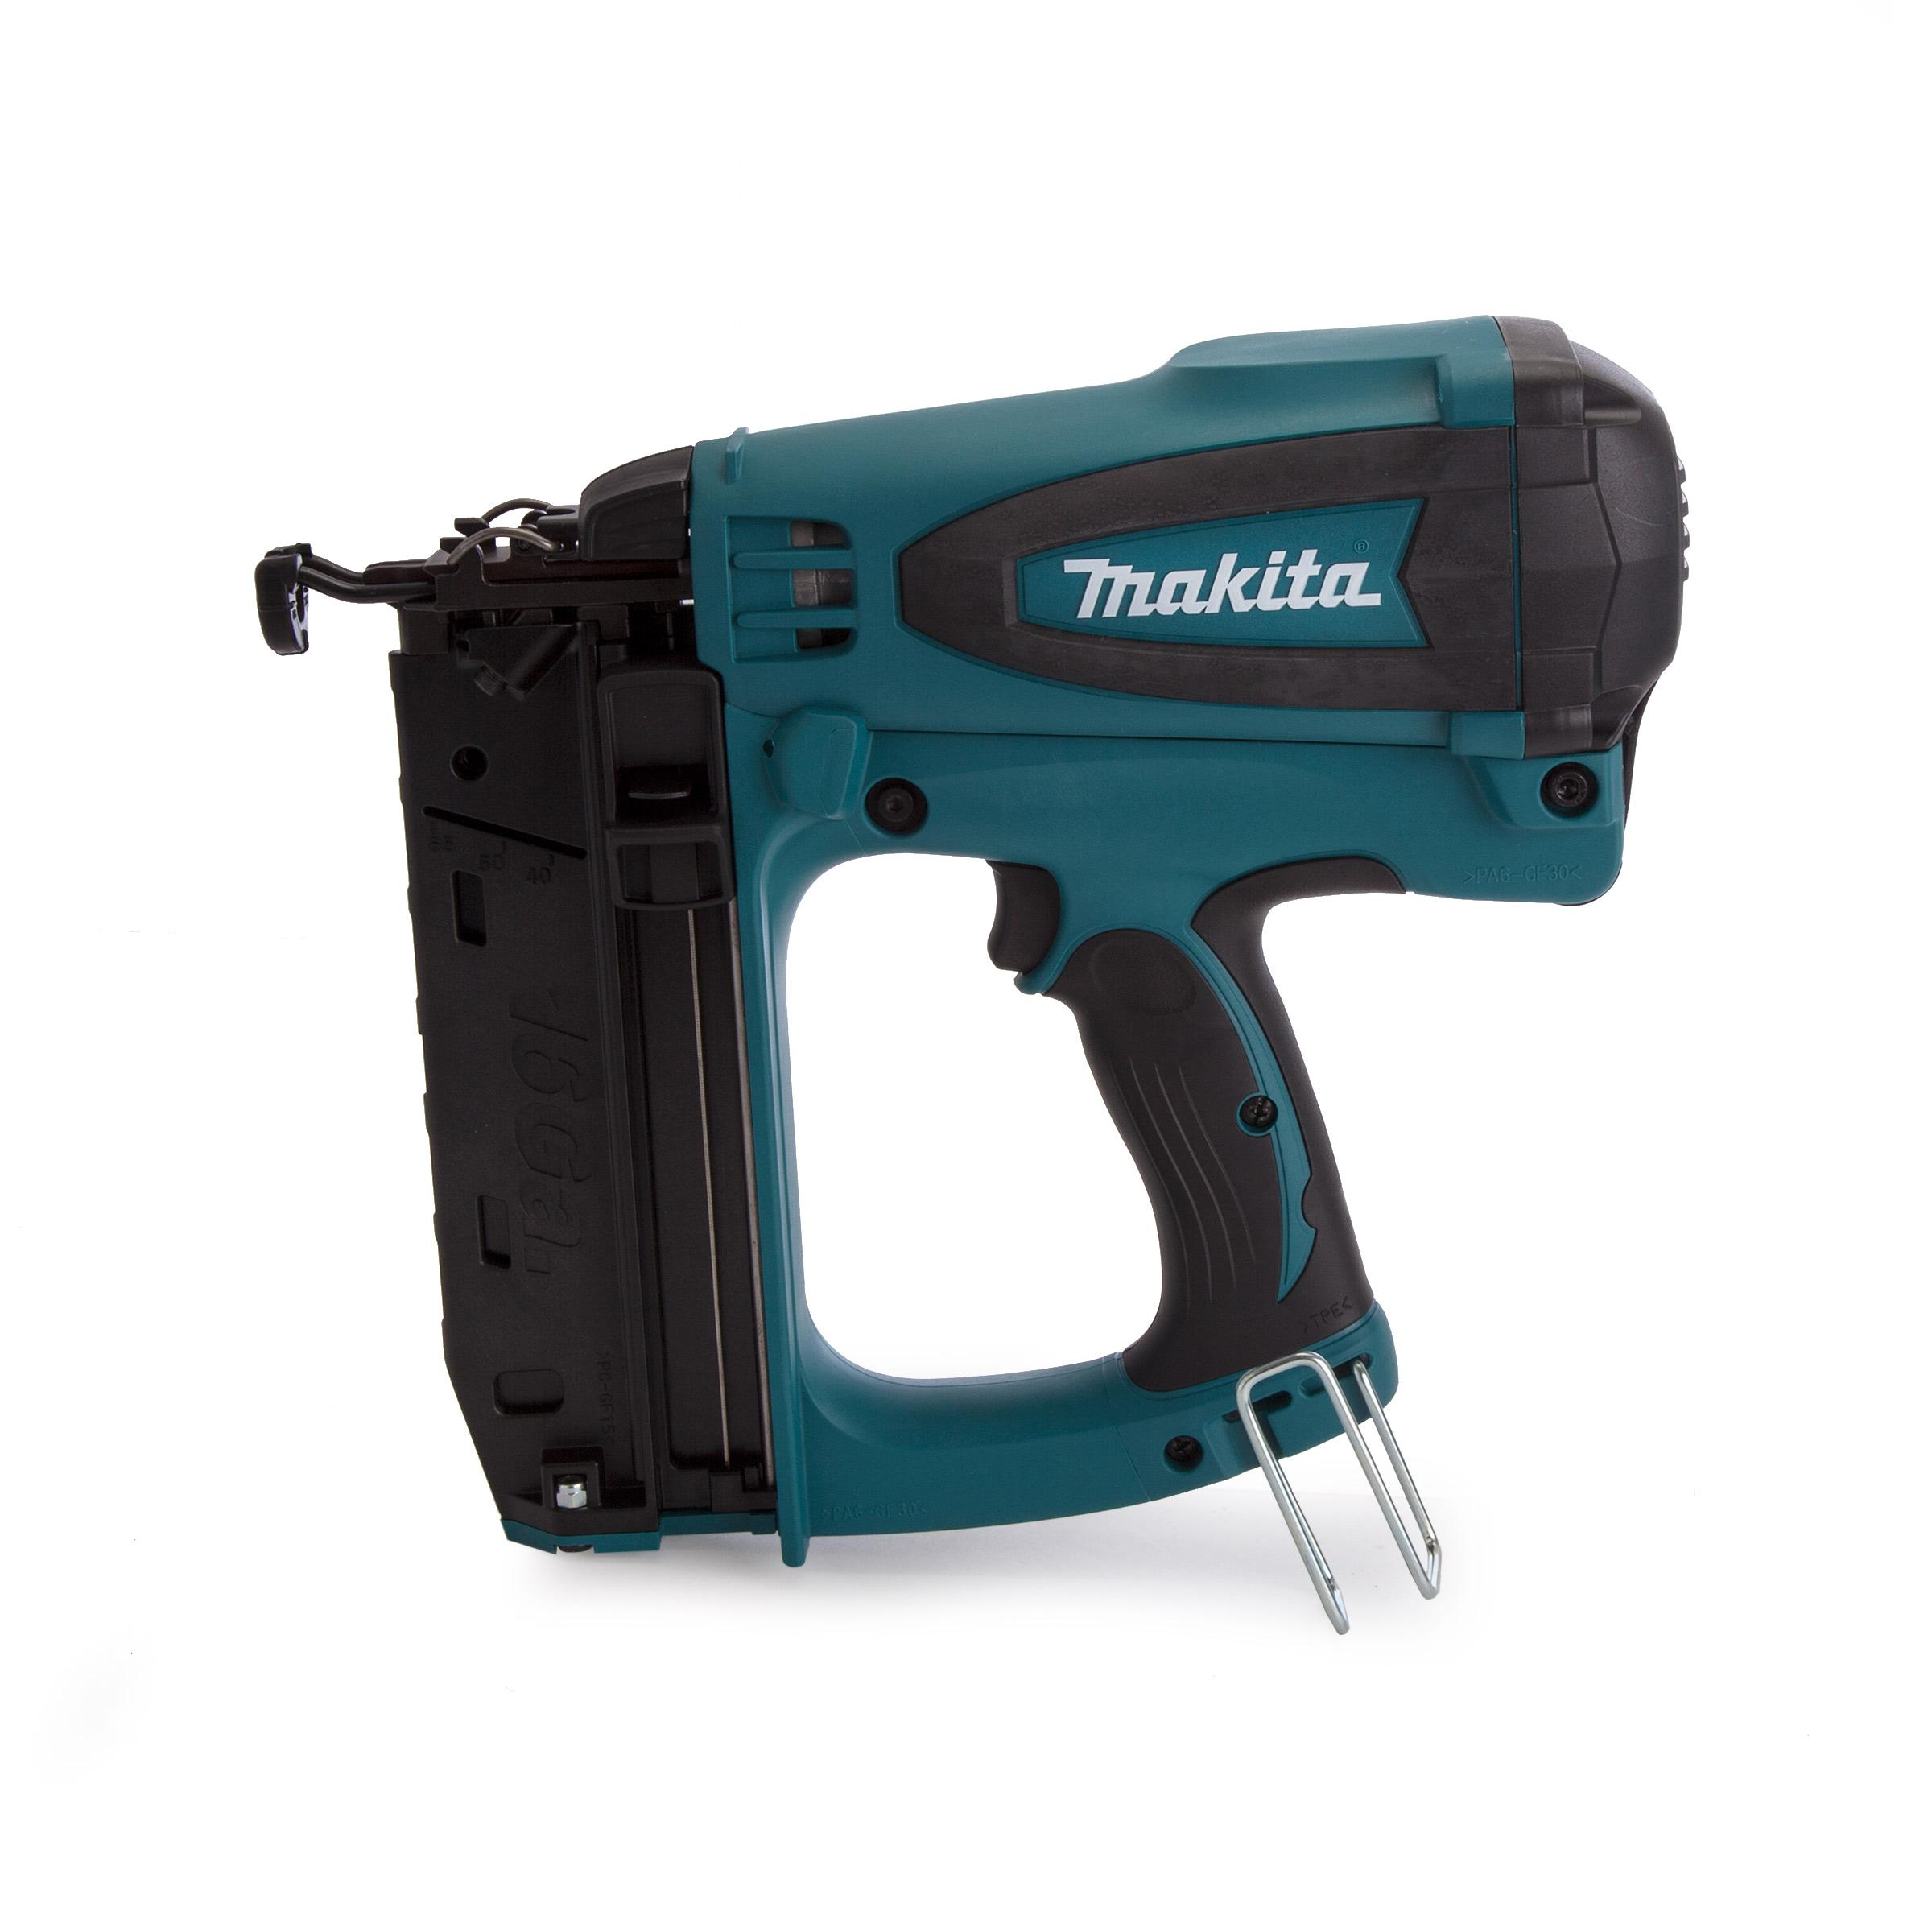 Makita 7 2v 2nd Fix Finishing Gas Nail Gun Gf600se Mj